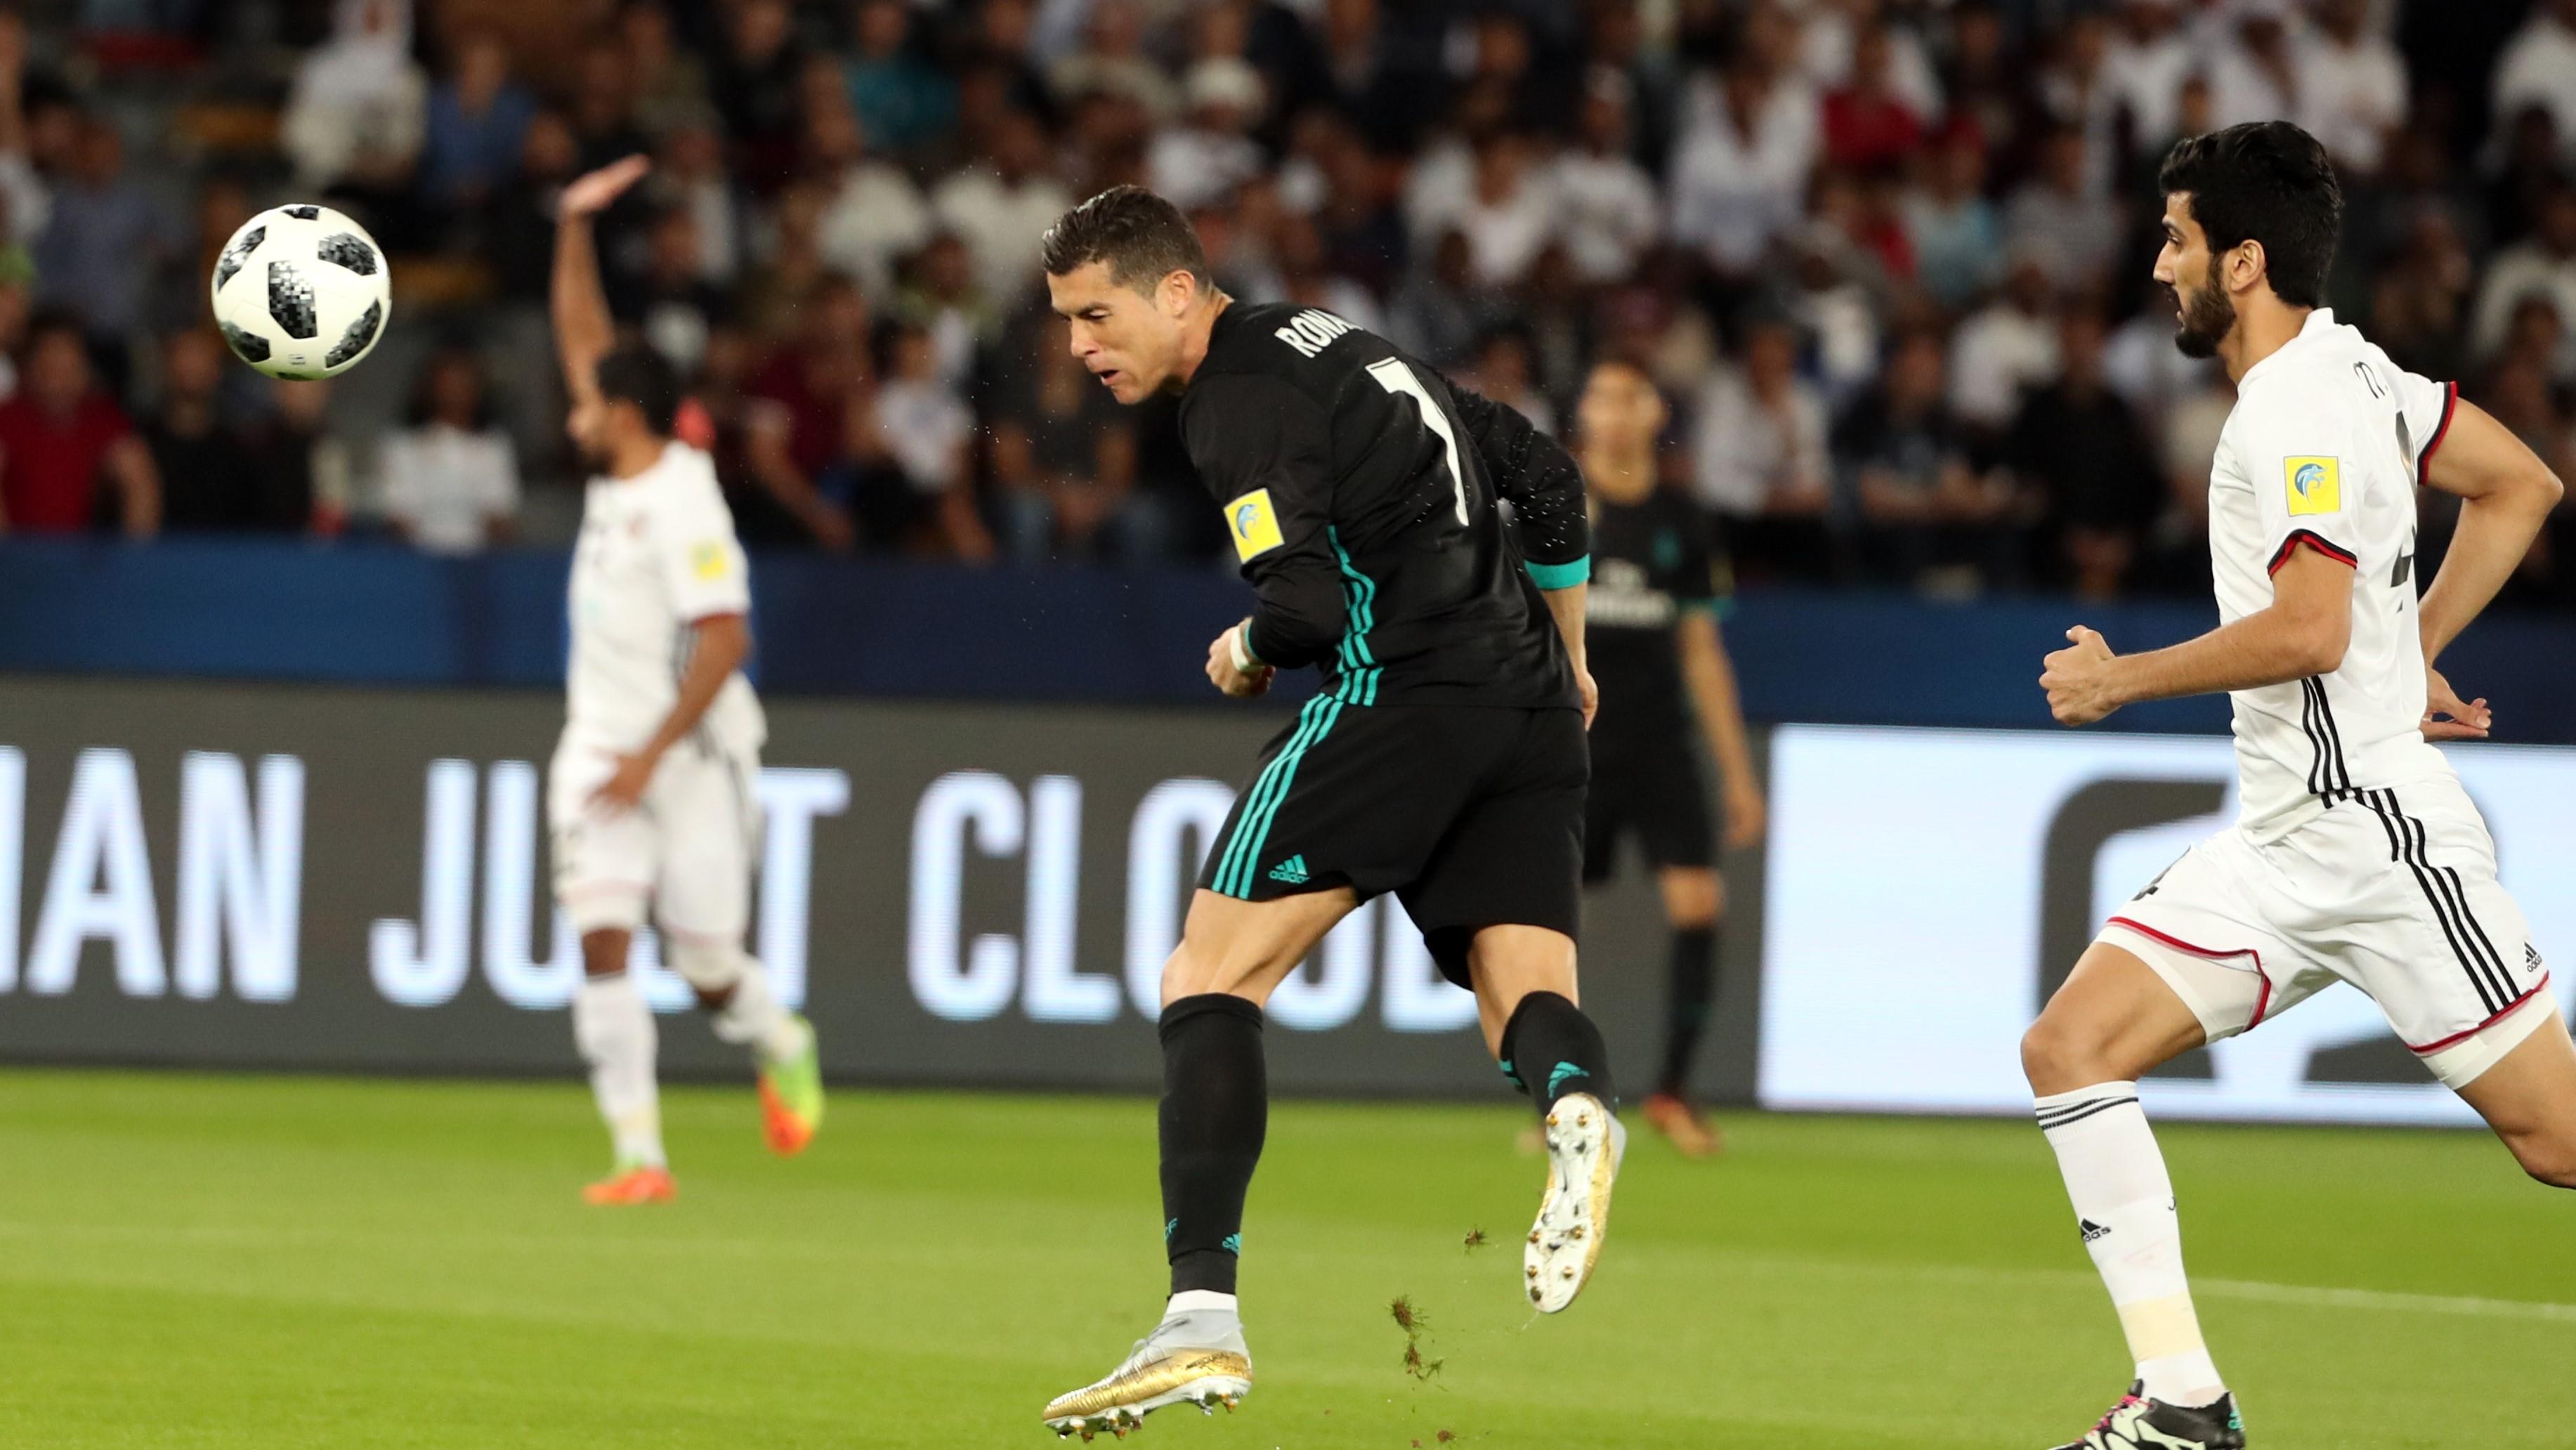 Cristiano Ronaldo Real Madrid Al Jazira Club World Cup 13122017